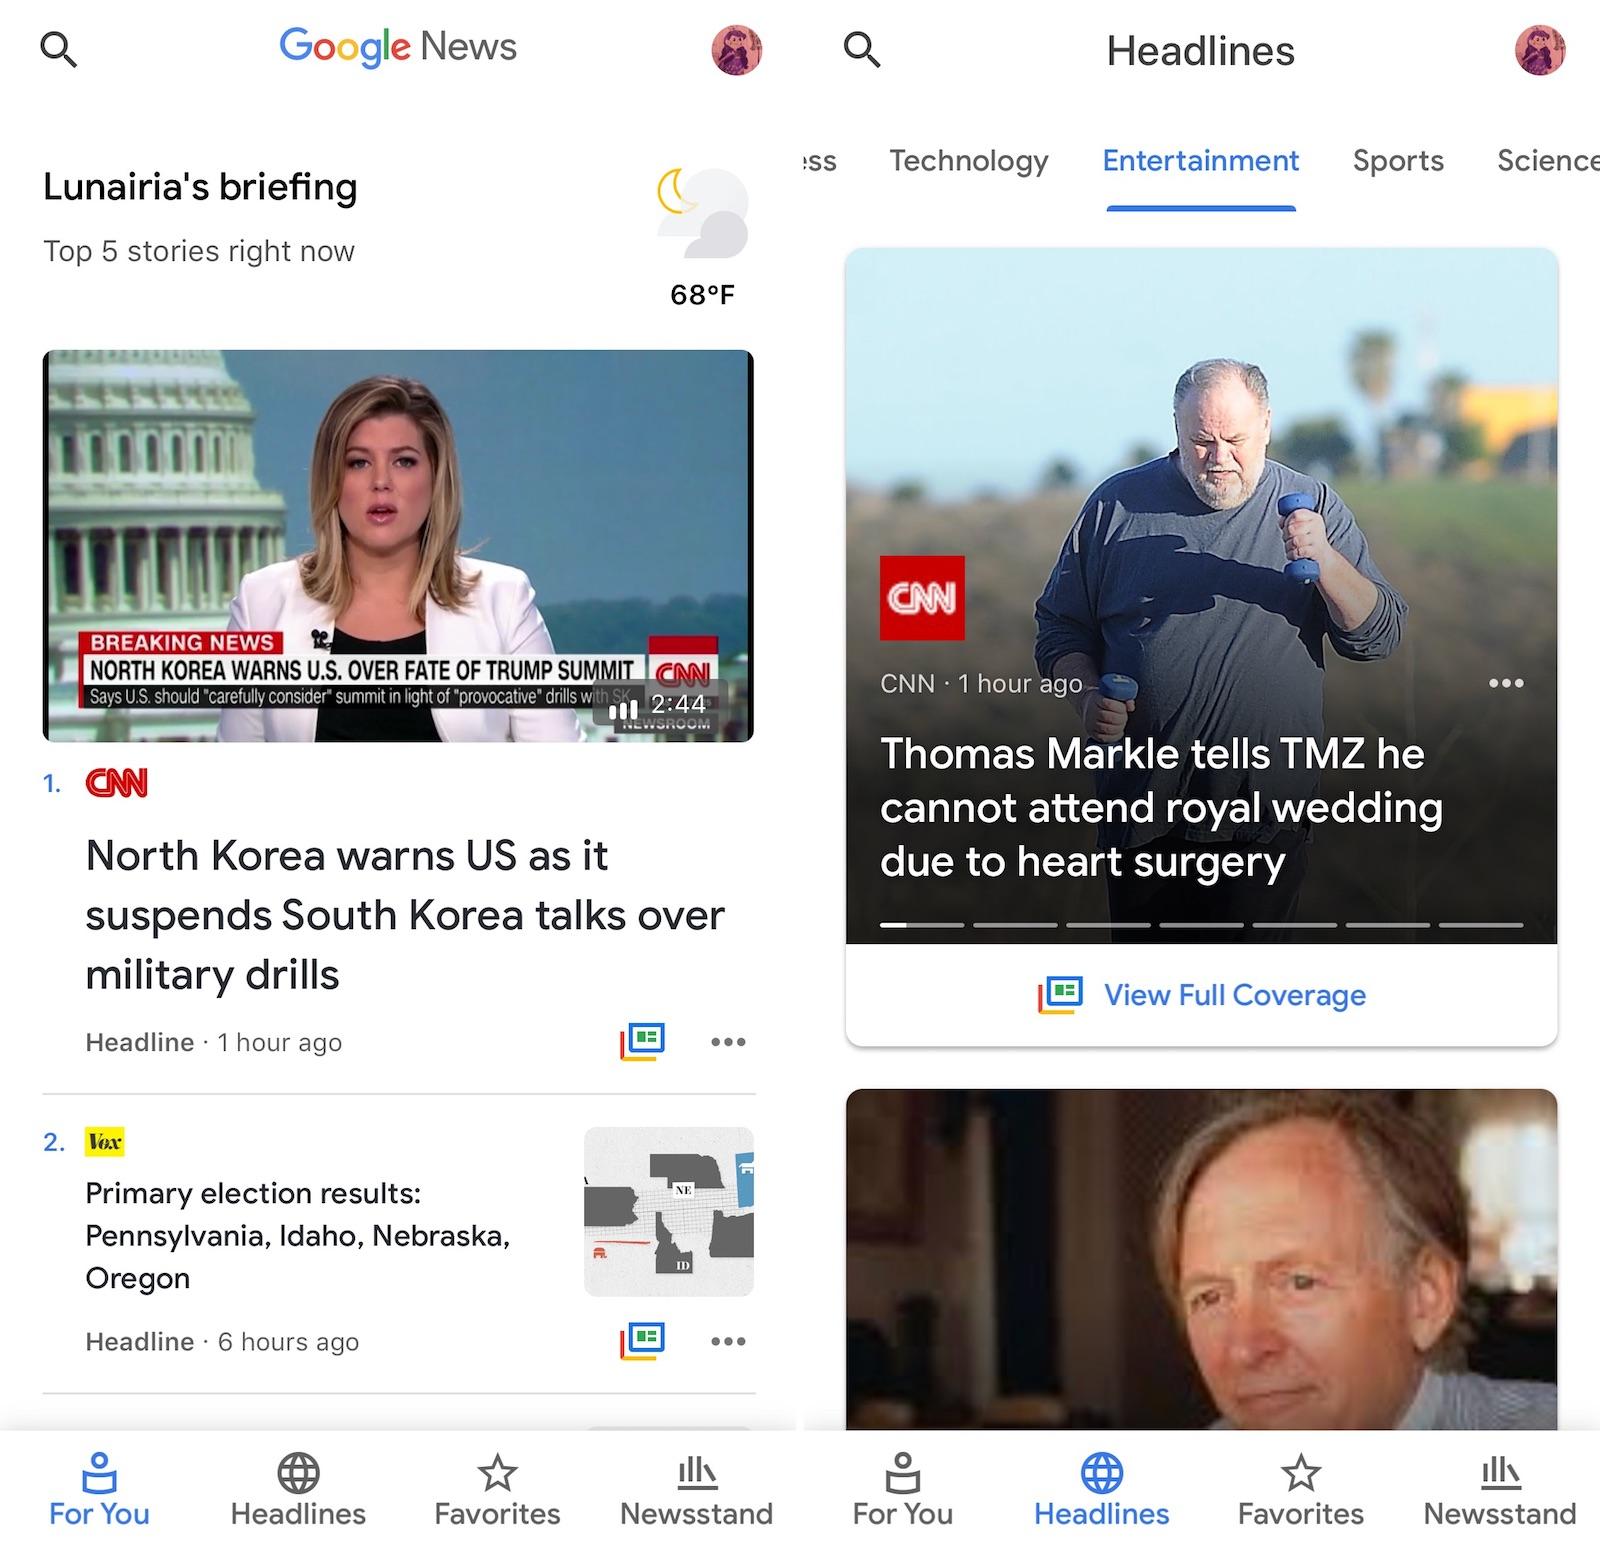 Google News briefing